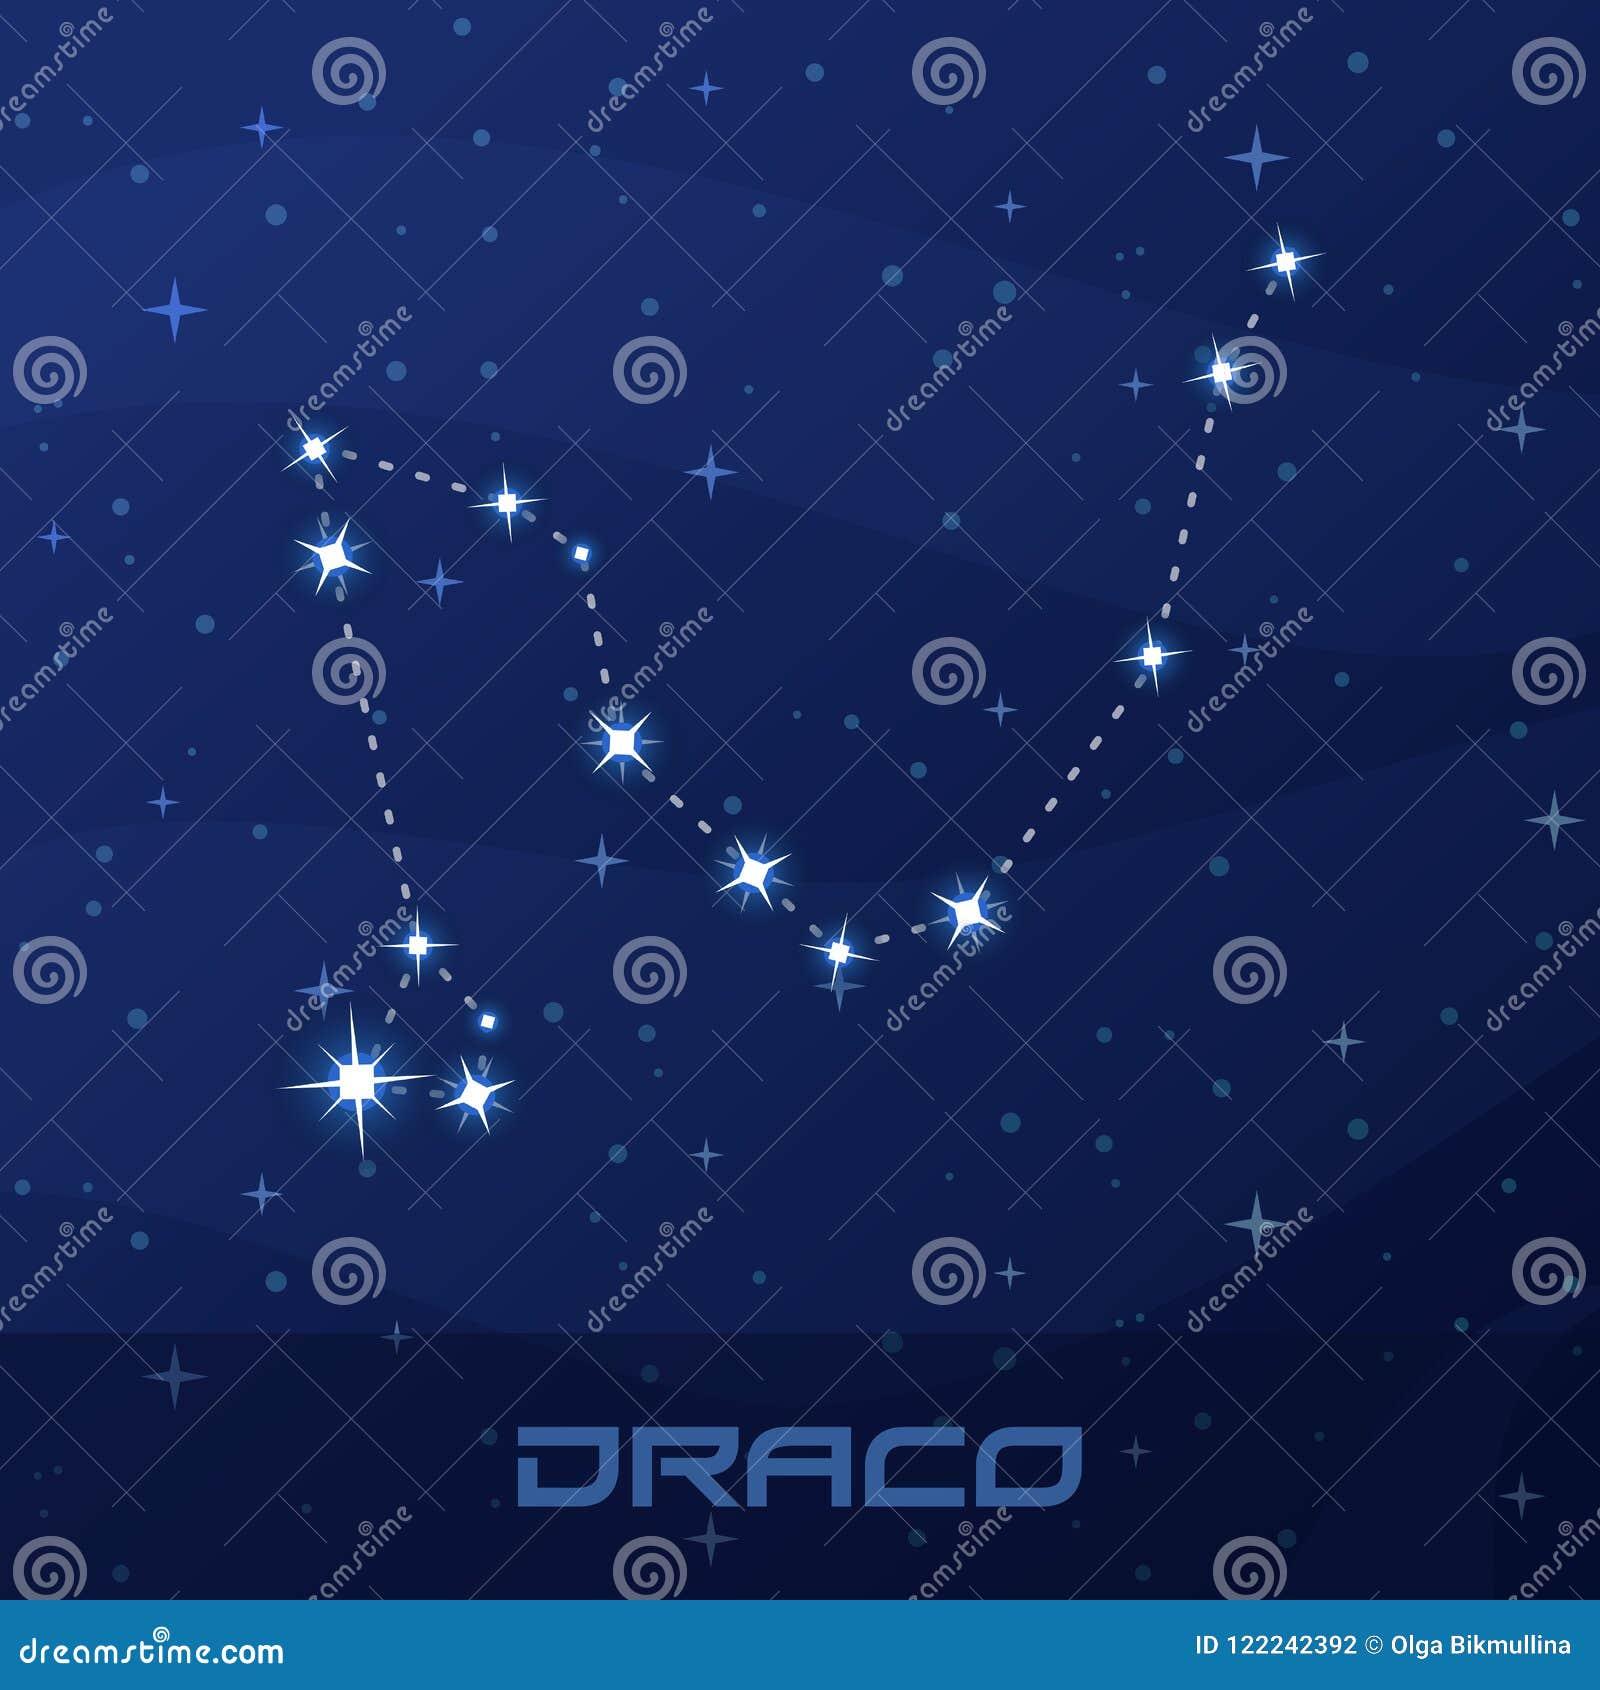 Constellation Draco, Dragon, Night Star Sky Stock Vector